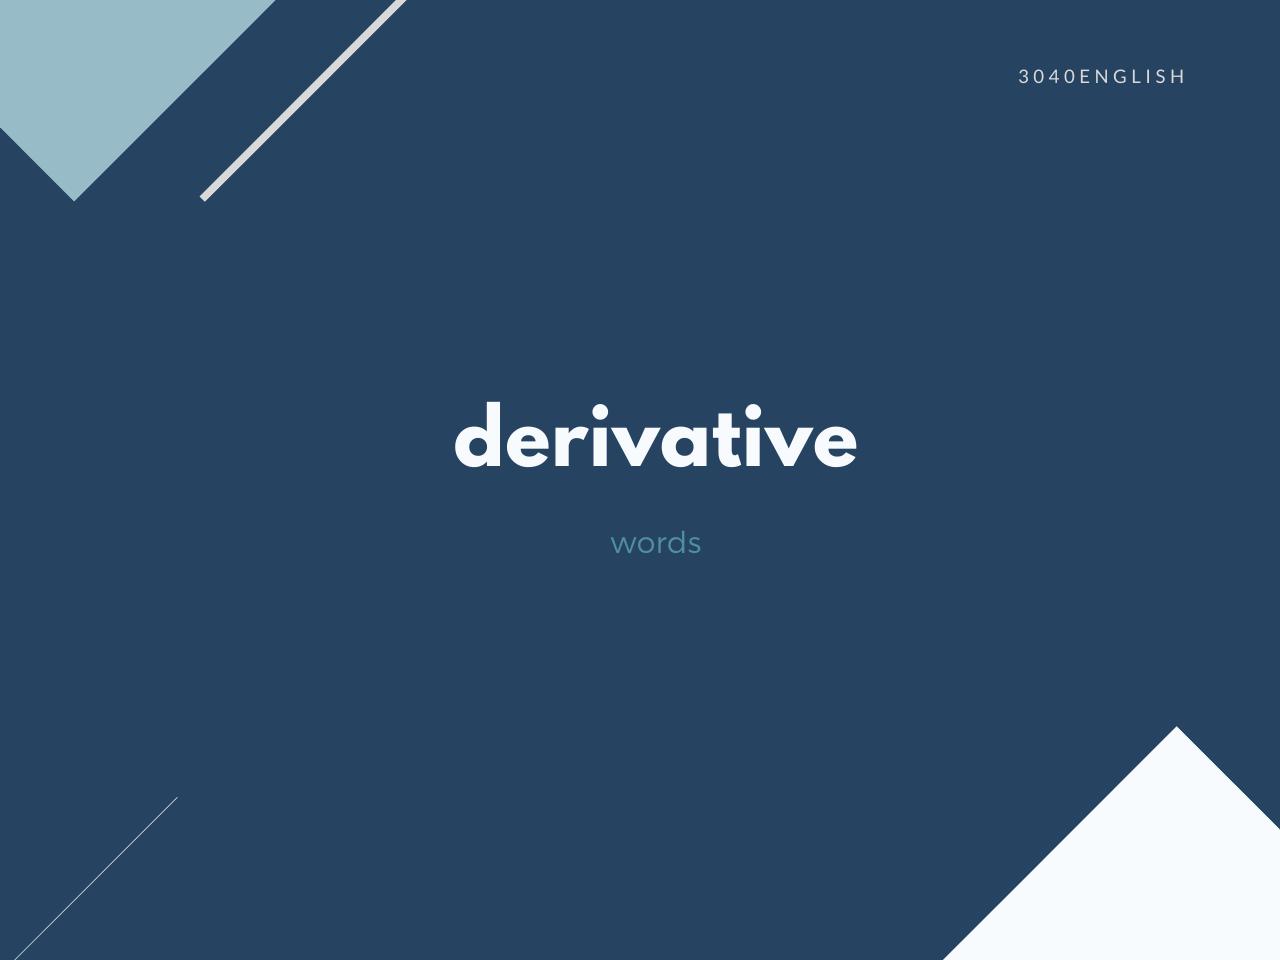 derivative の意味と簡単な使い方【音読用例文あり】